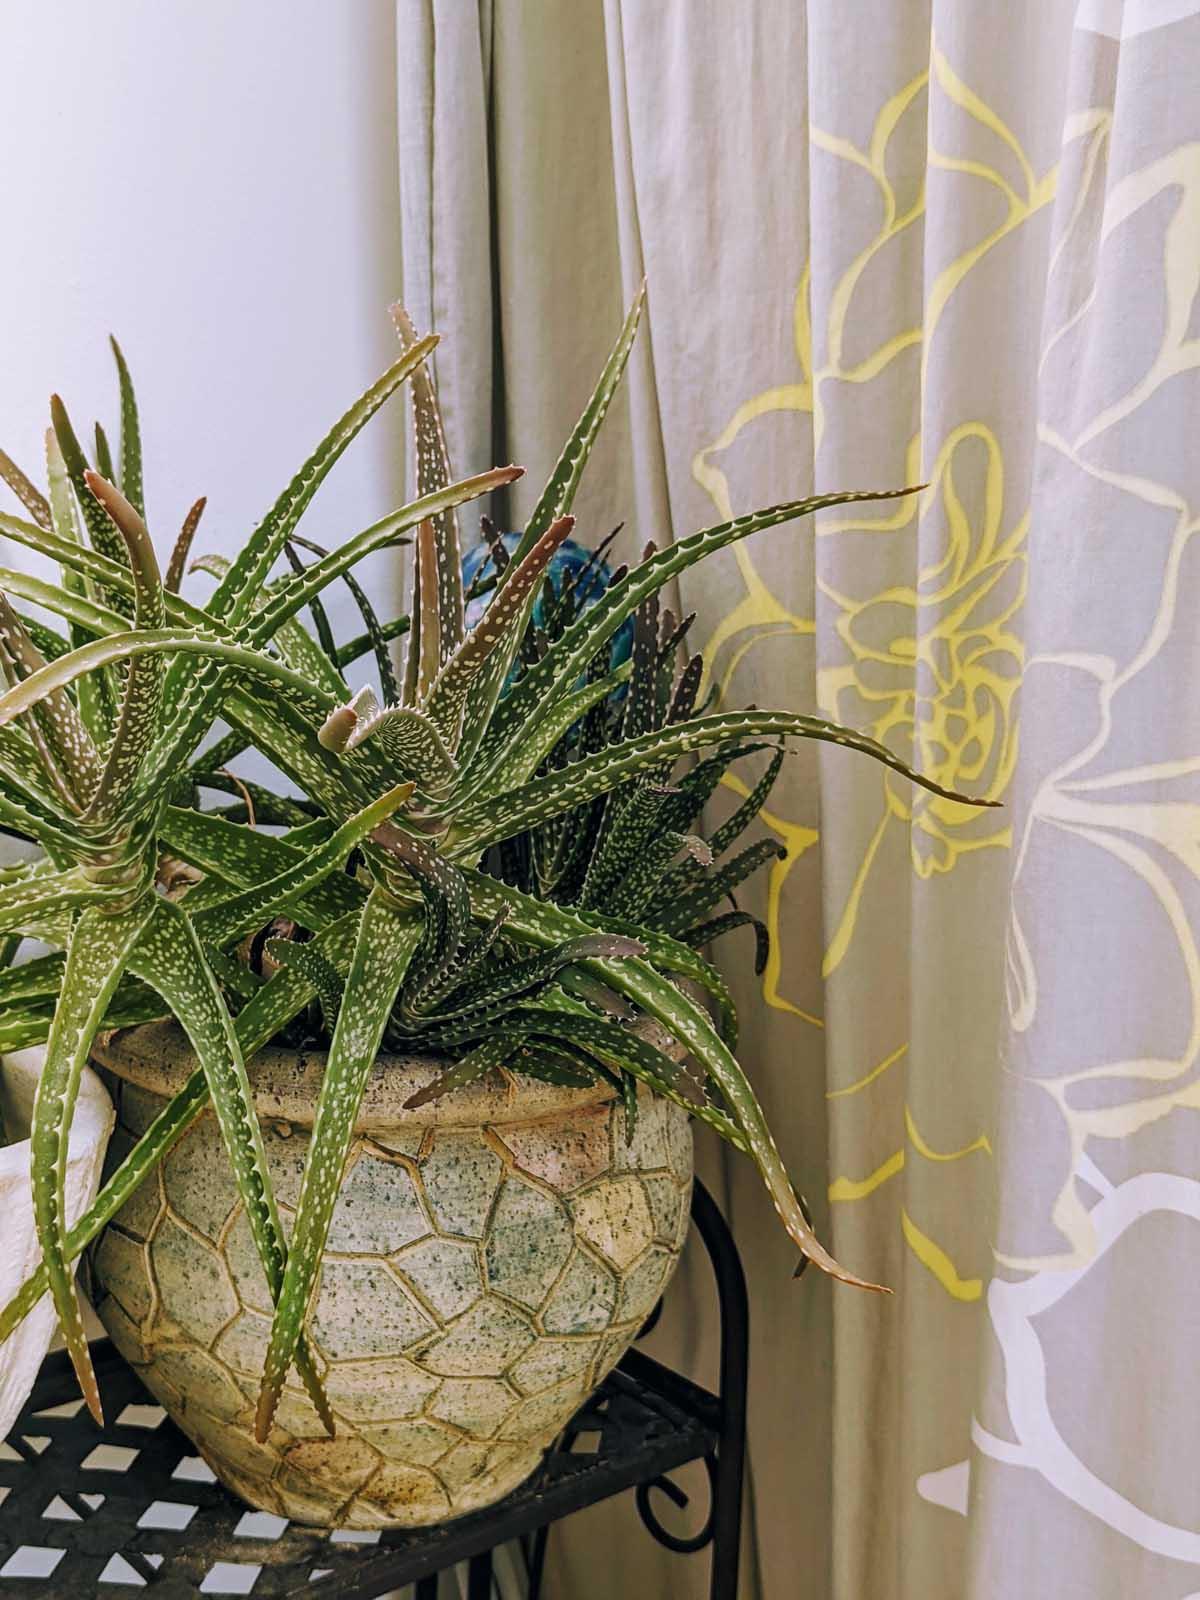 Growing Aloe Indoors Next to the Bathtub